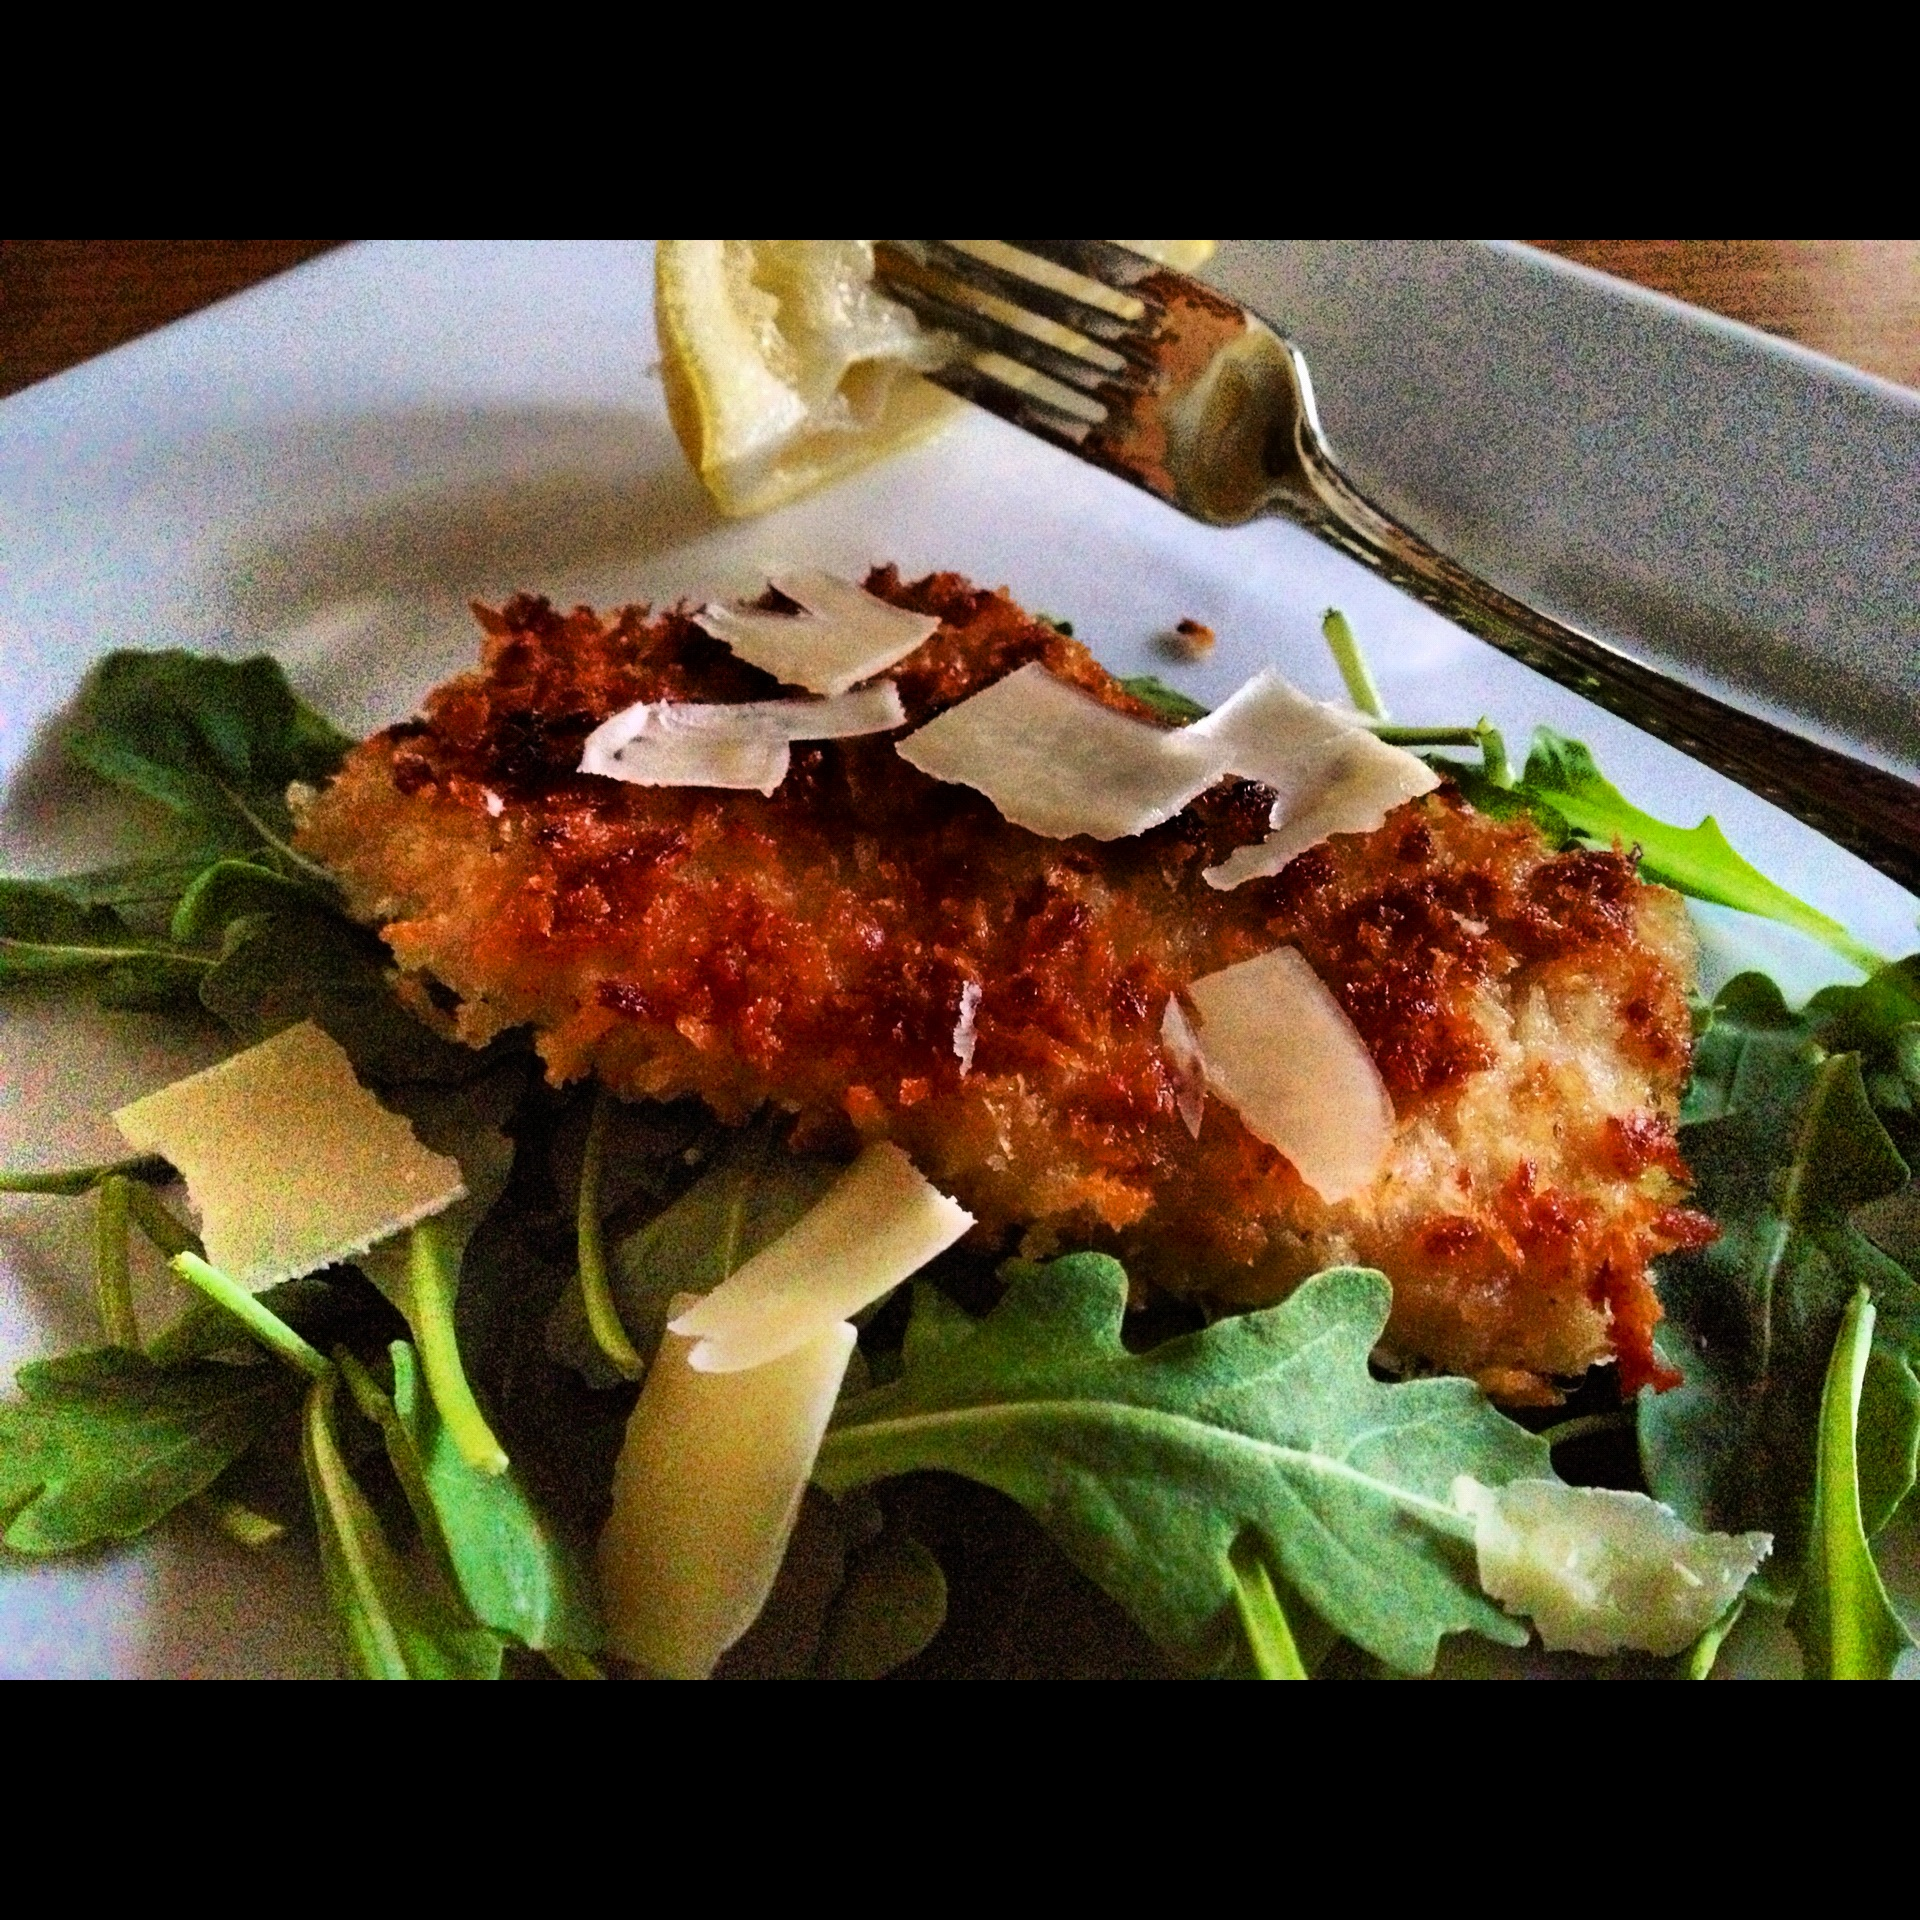 Pork Loin Milanese with Arugula Salad